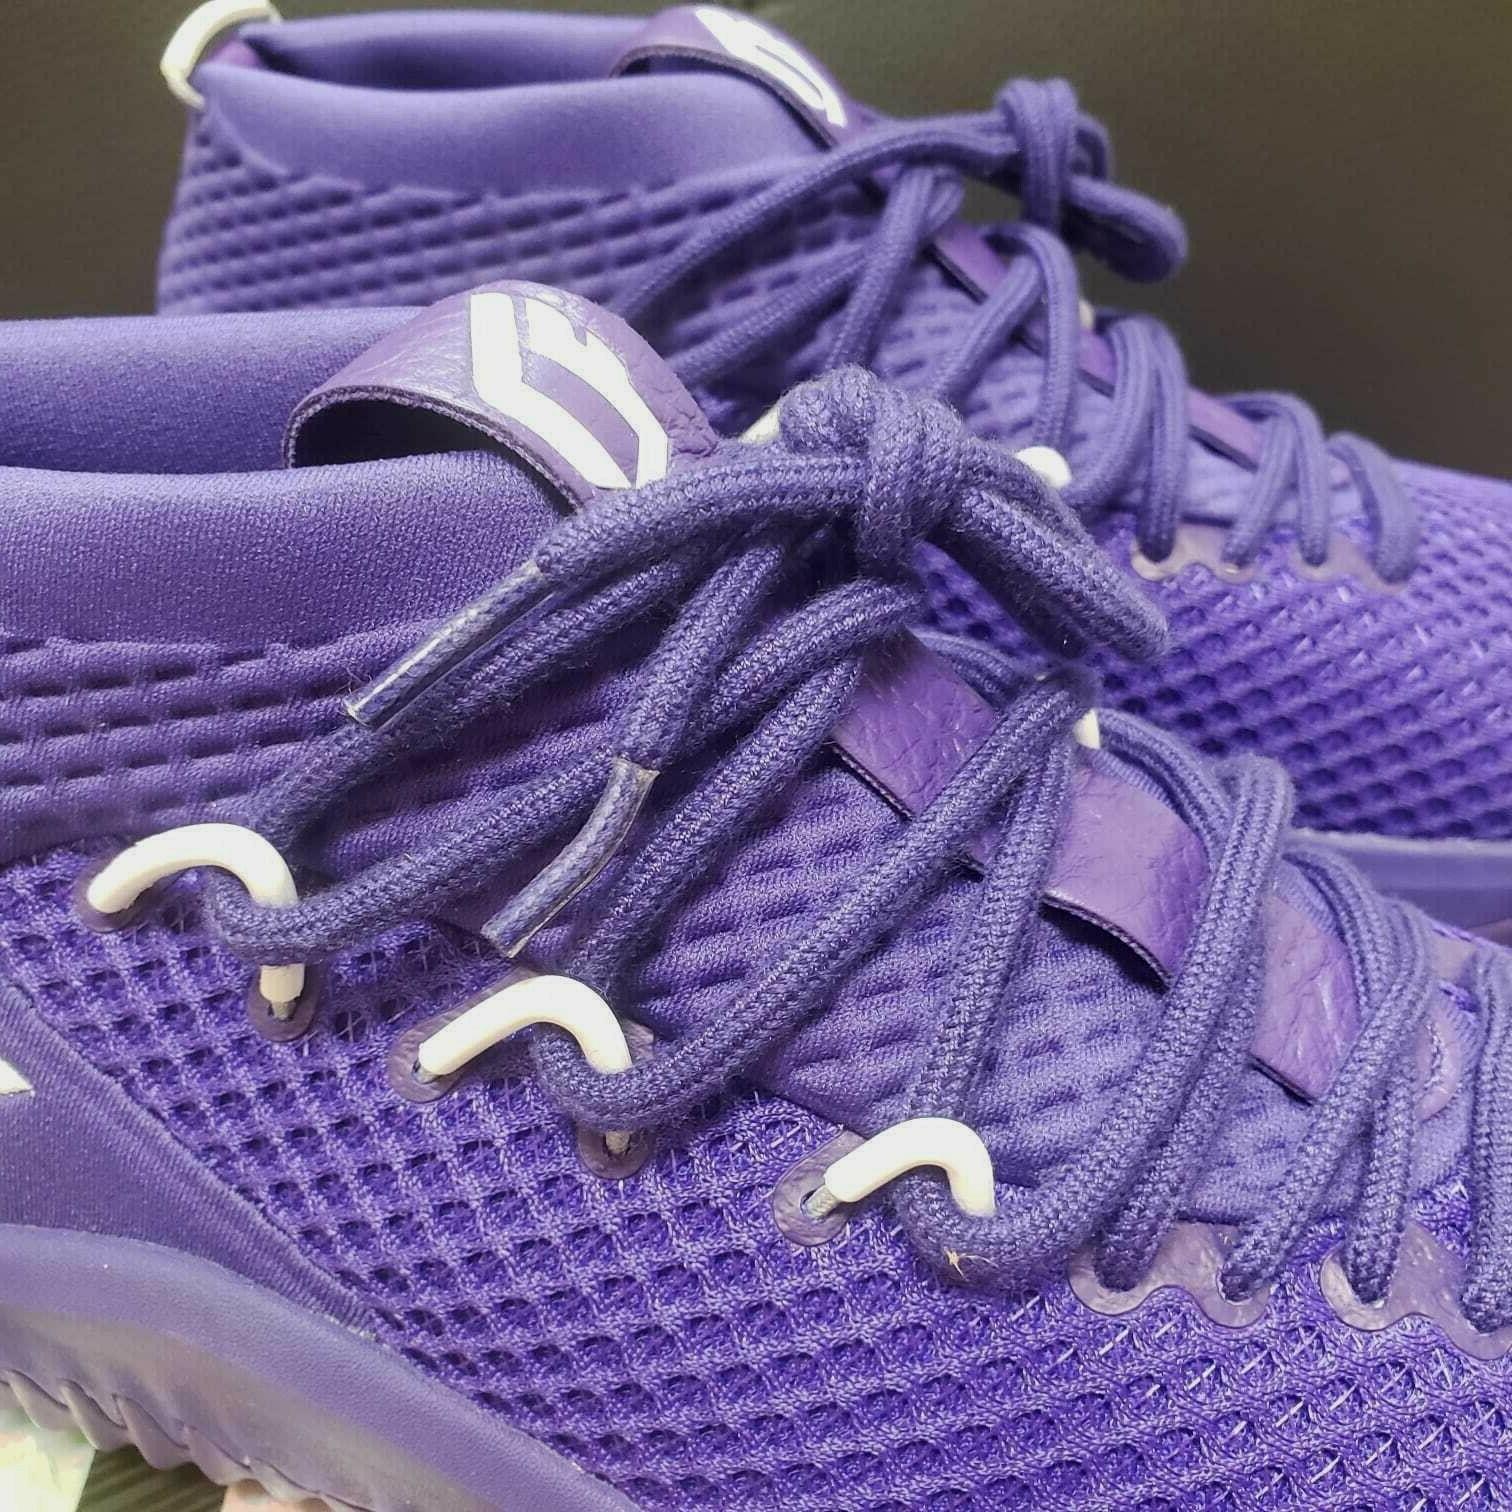 New Dame 4 Men's Basketball Shoes Damian Lillard sizes or